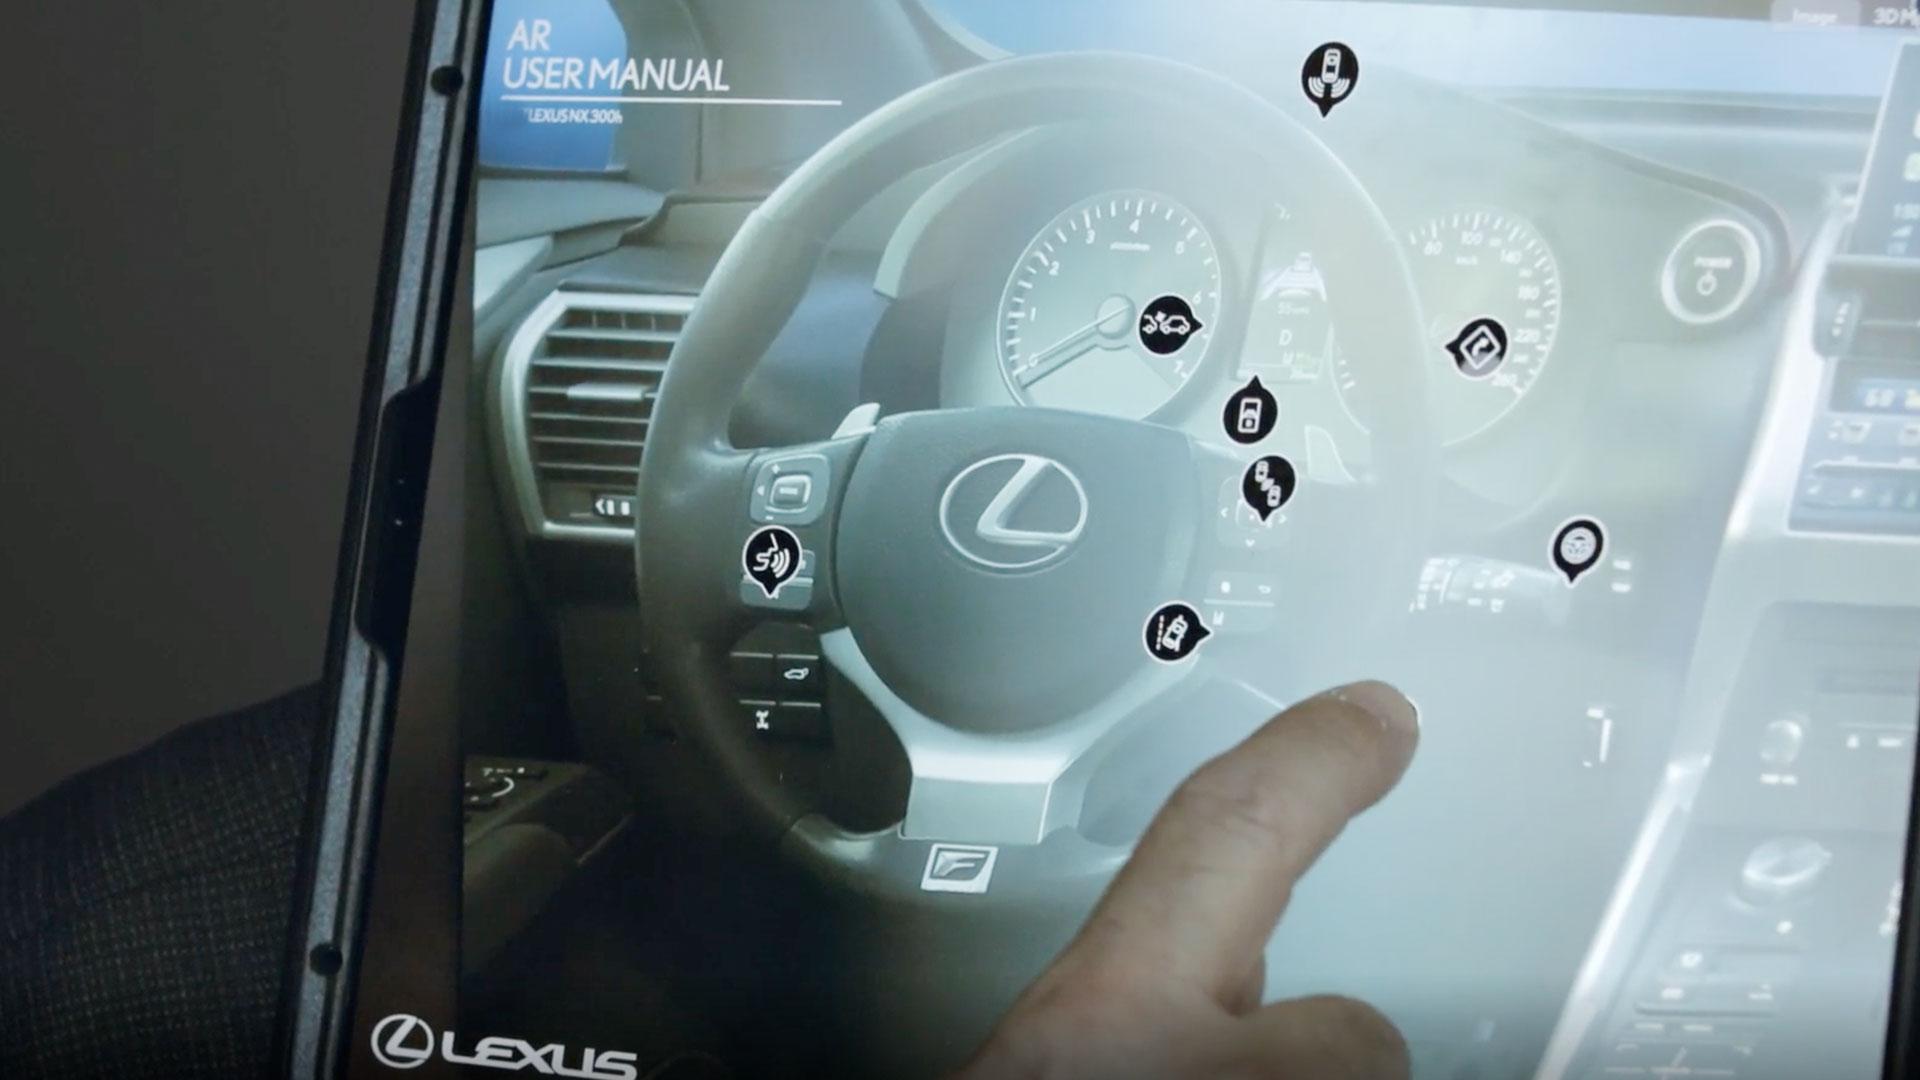 Lexus augmented reality